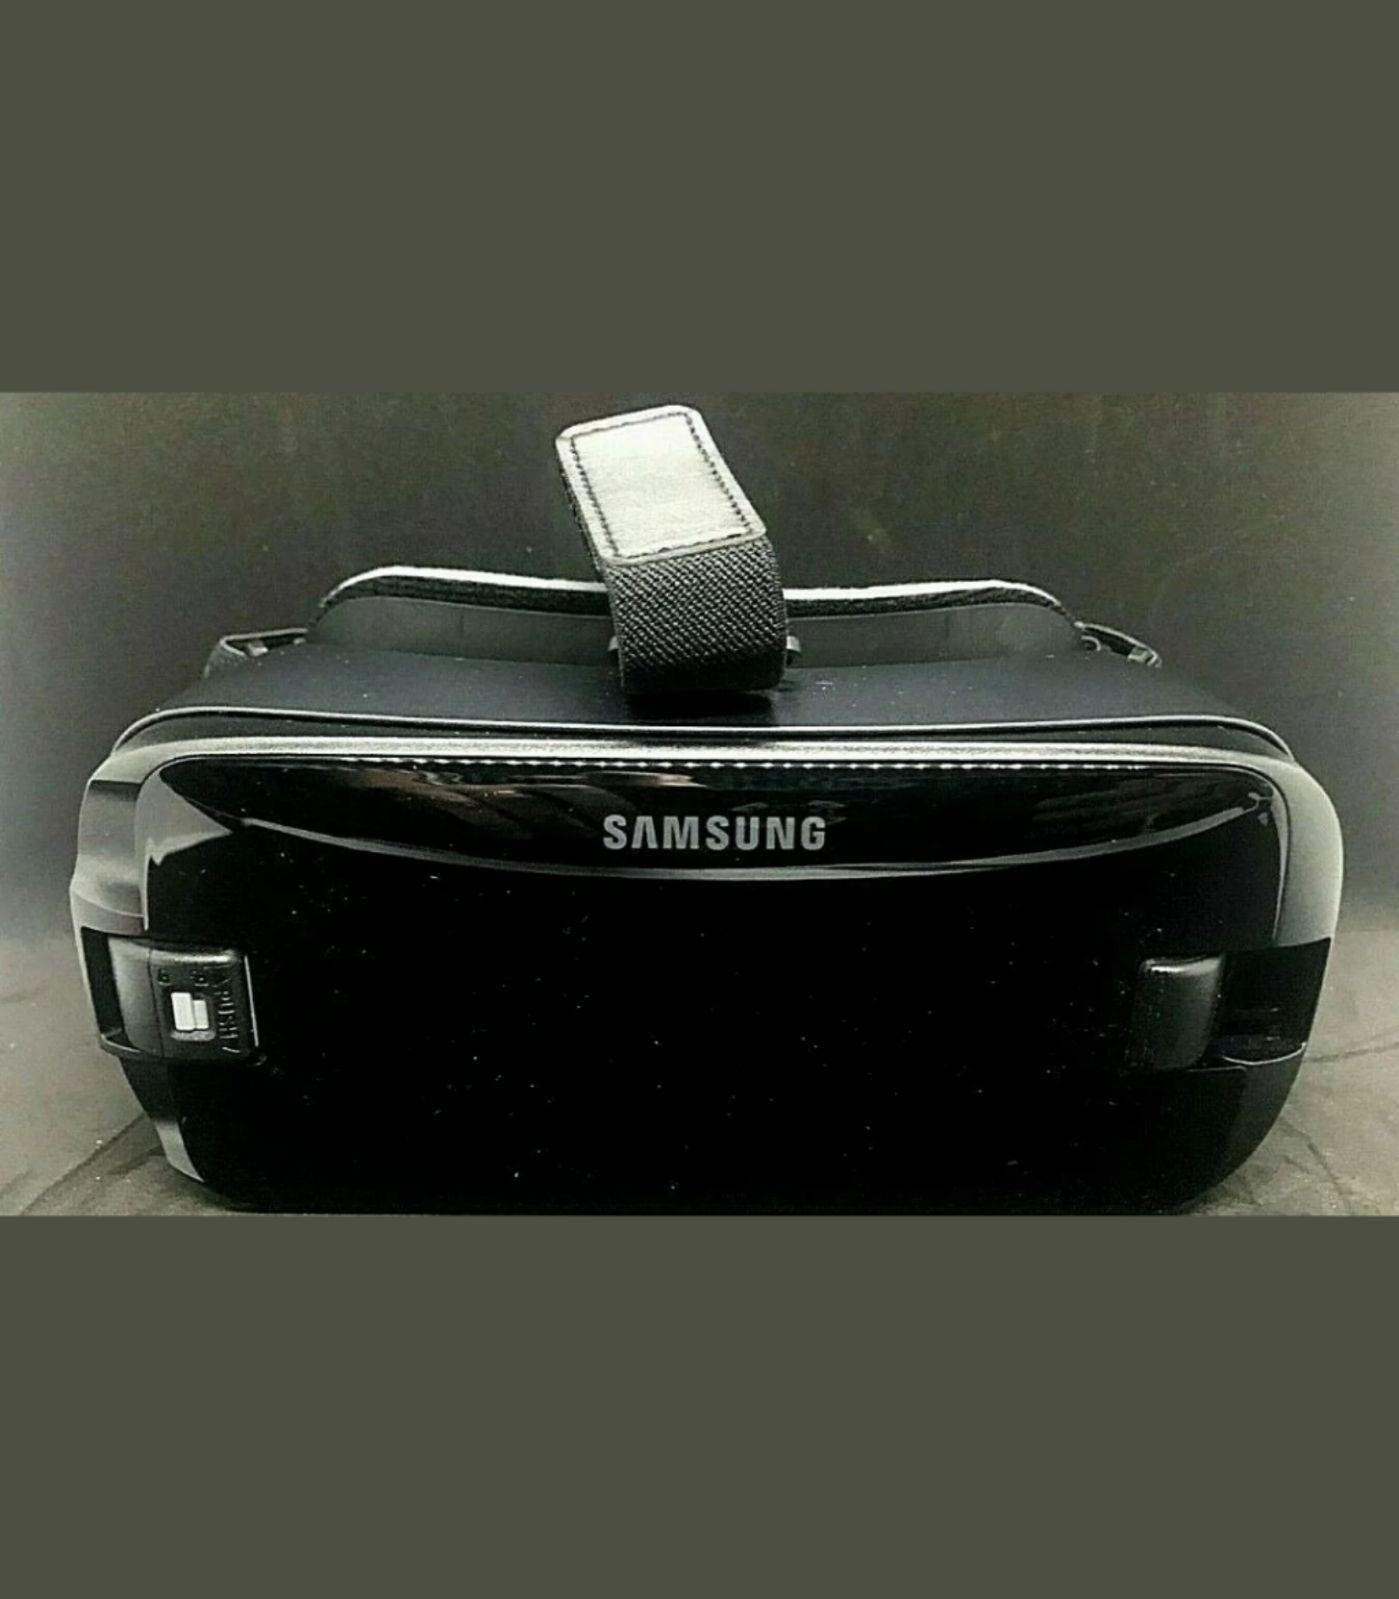 Samsung Galaxy VR headset with remote SM